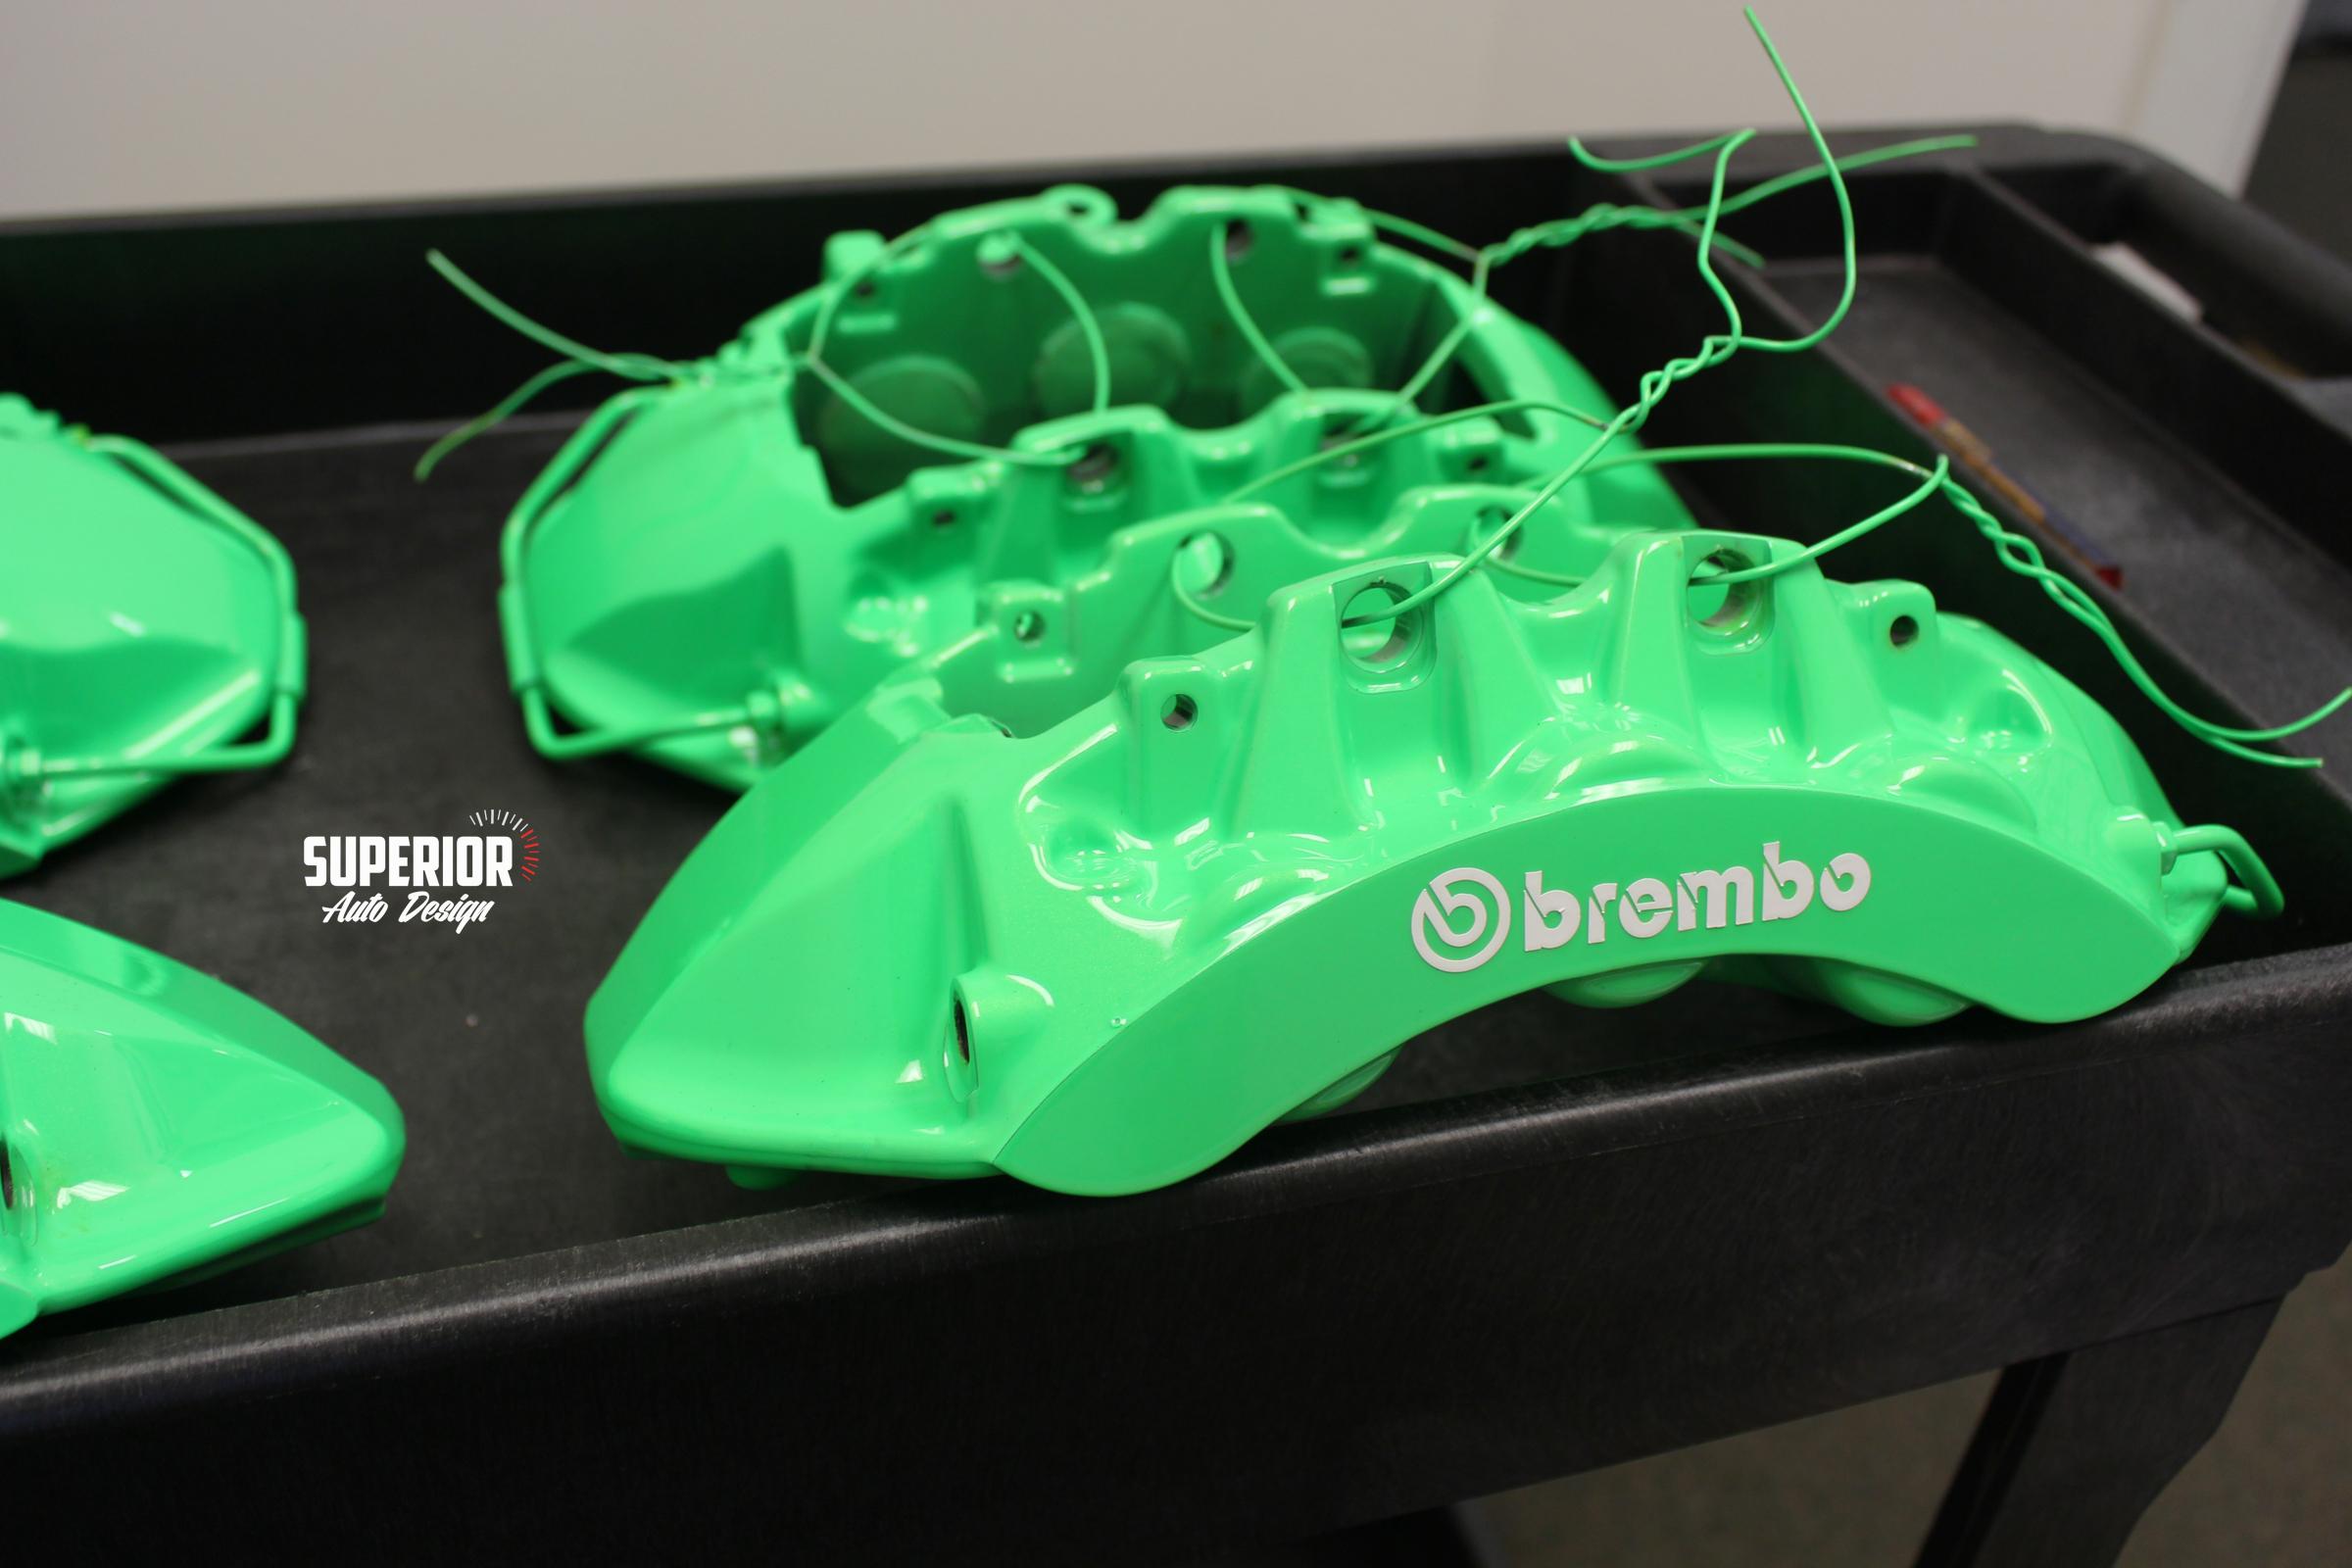 brembo-powder-coat-superior-auto-design-1